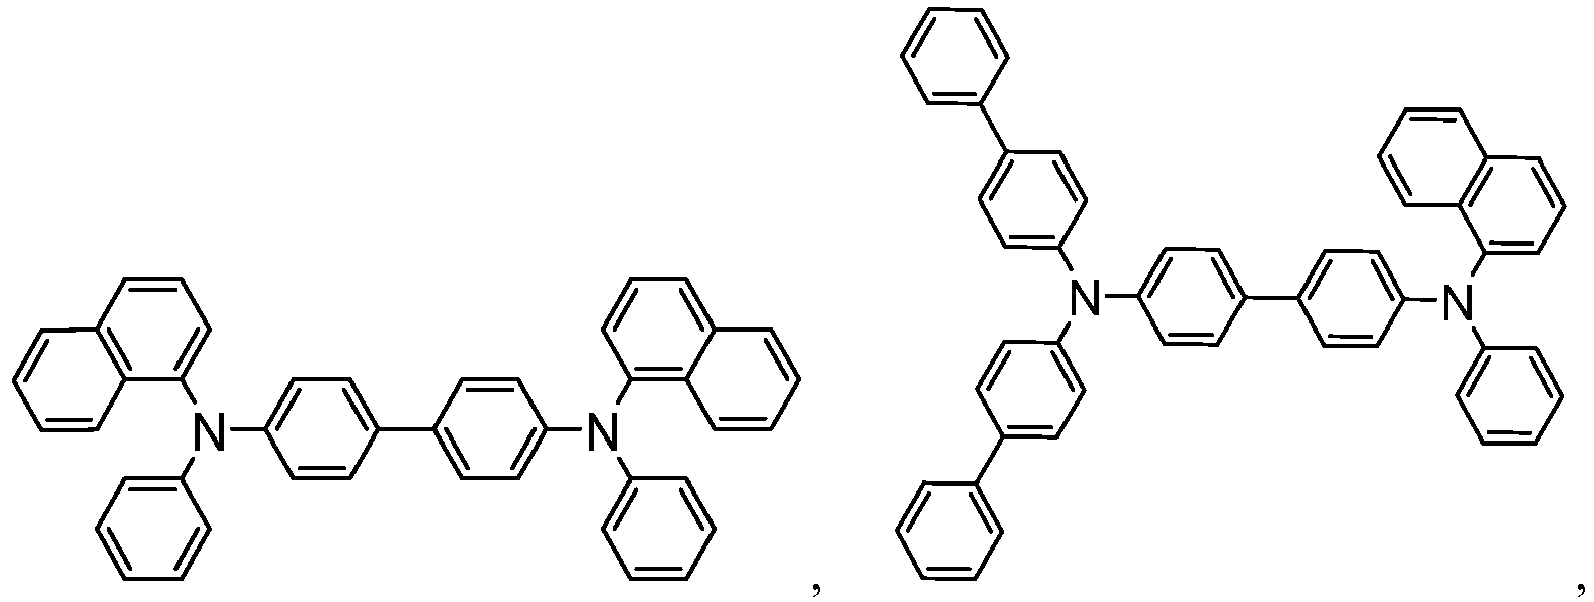 Figure imgb0868